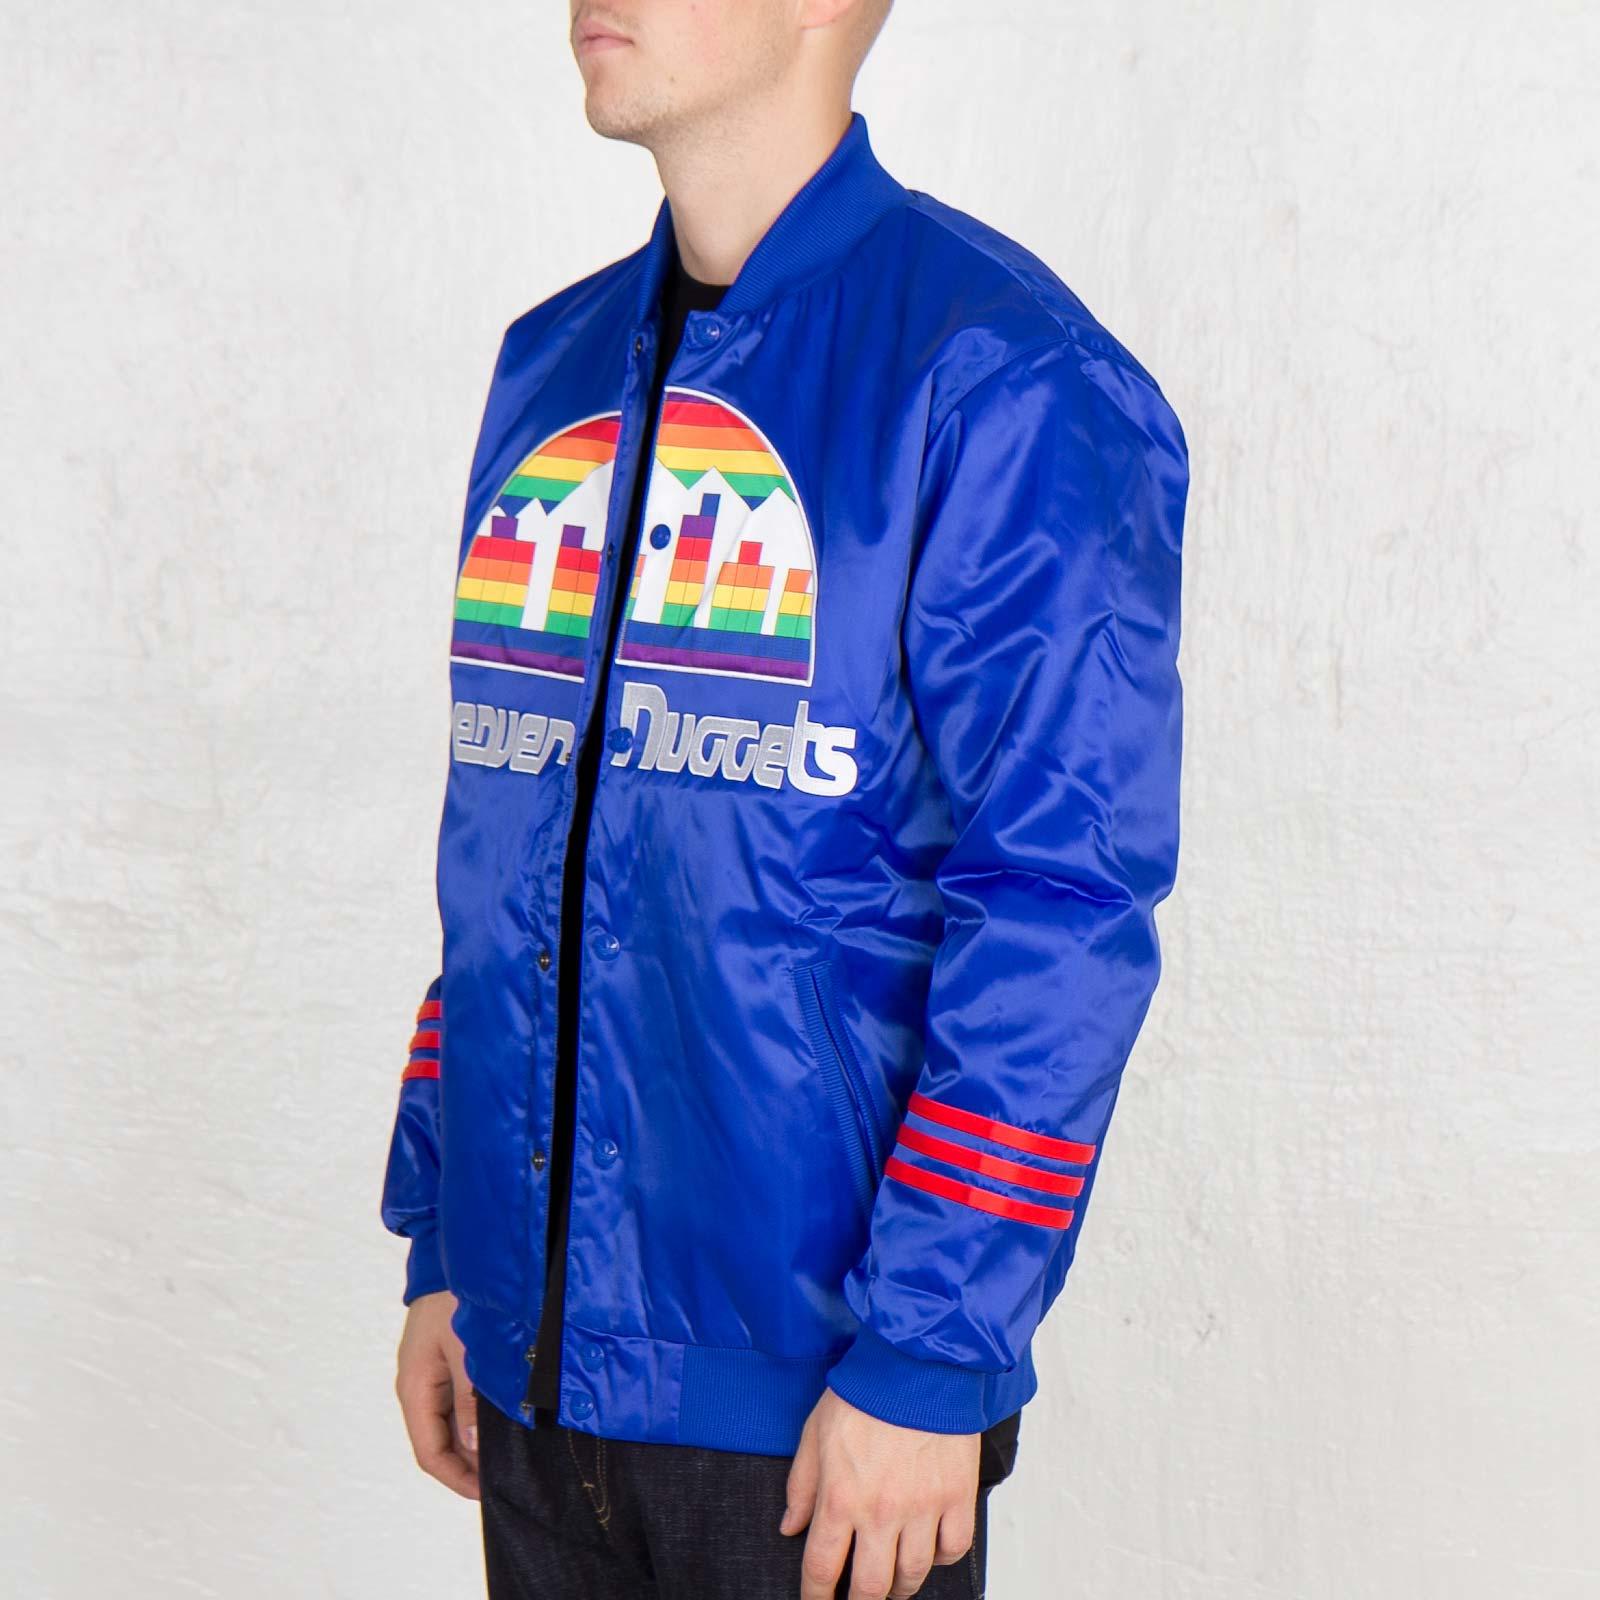 on sale 4efd3 fbe2e adidas NBA Denver Nuggets Jacket - G76318 - Sneakersnstuff ...